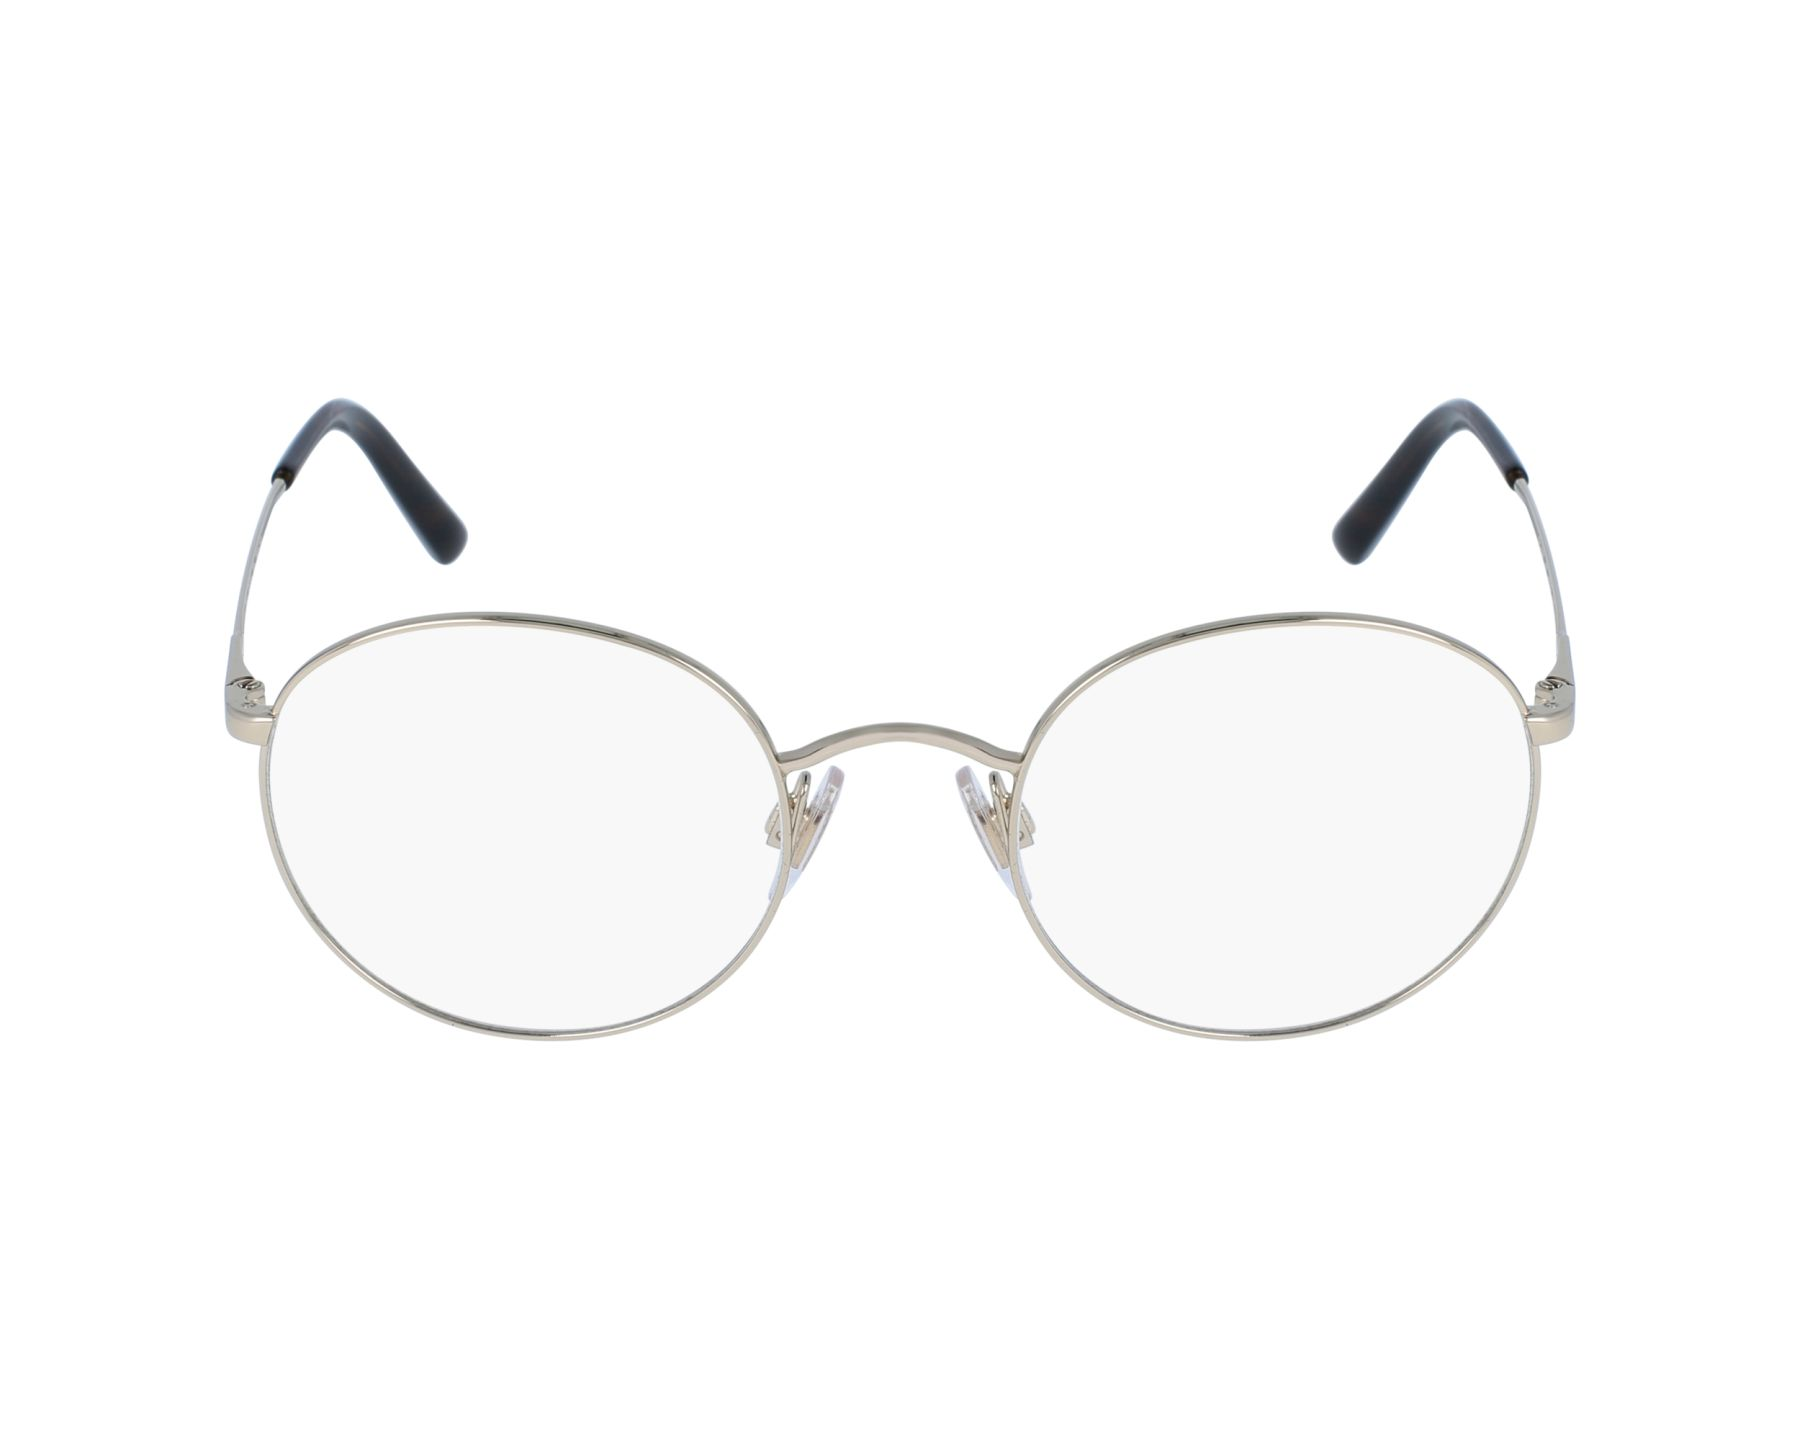 Dolce & Gabbana Eyeglasses Gold DG-1290 488 - Visionet US